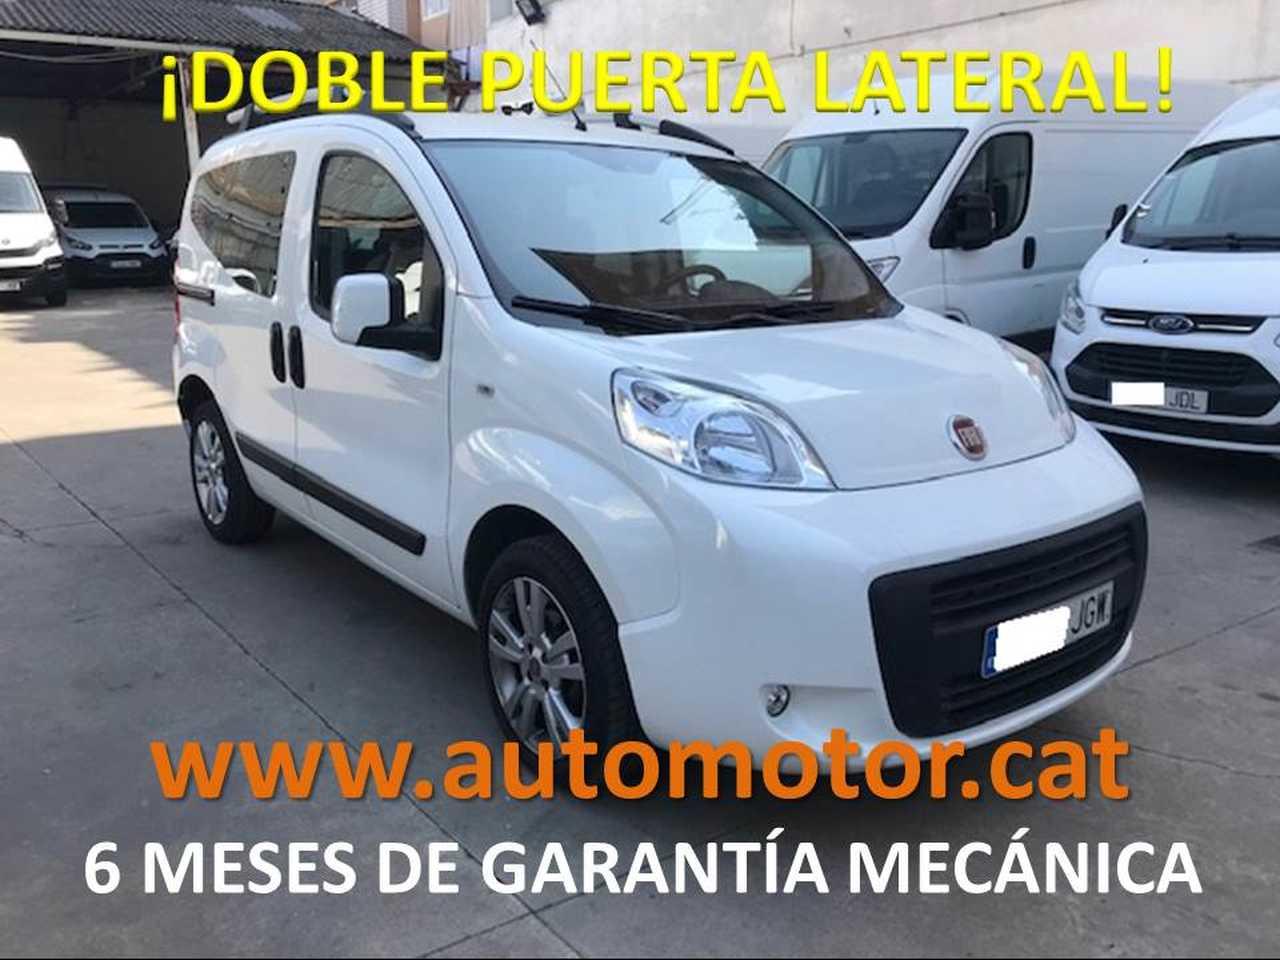 Fiat Qubo Fiorino  1.3Mjt Dynamic E5+ - GARANTIA MECANICA  - Foto 1